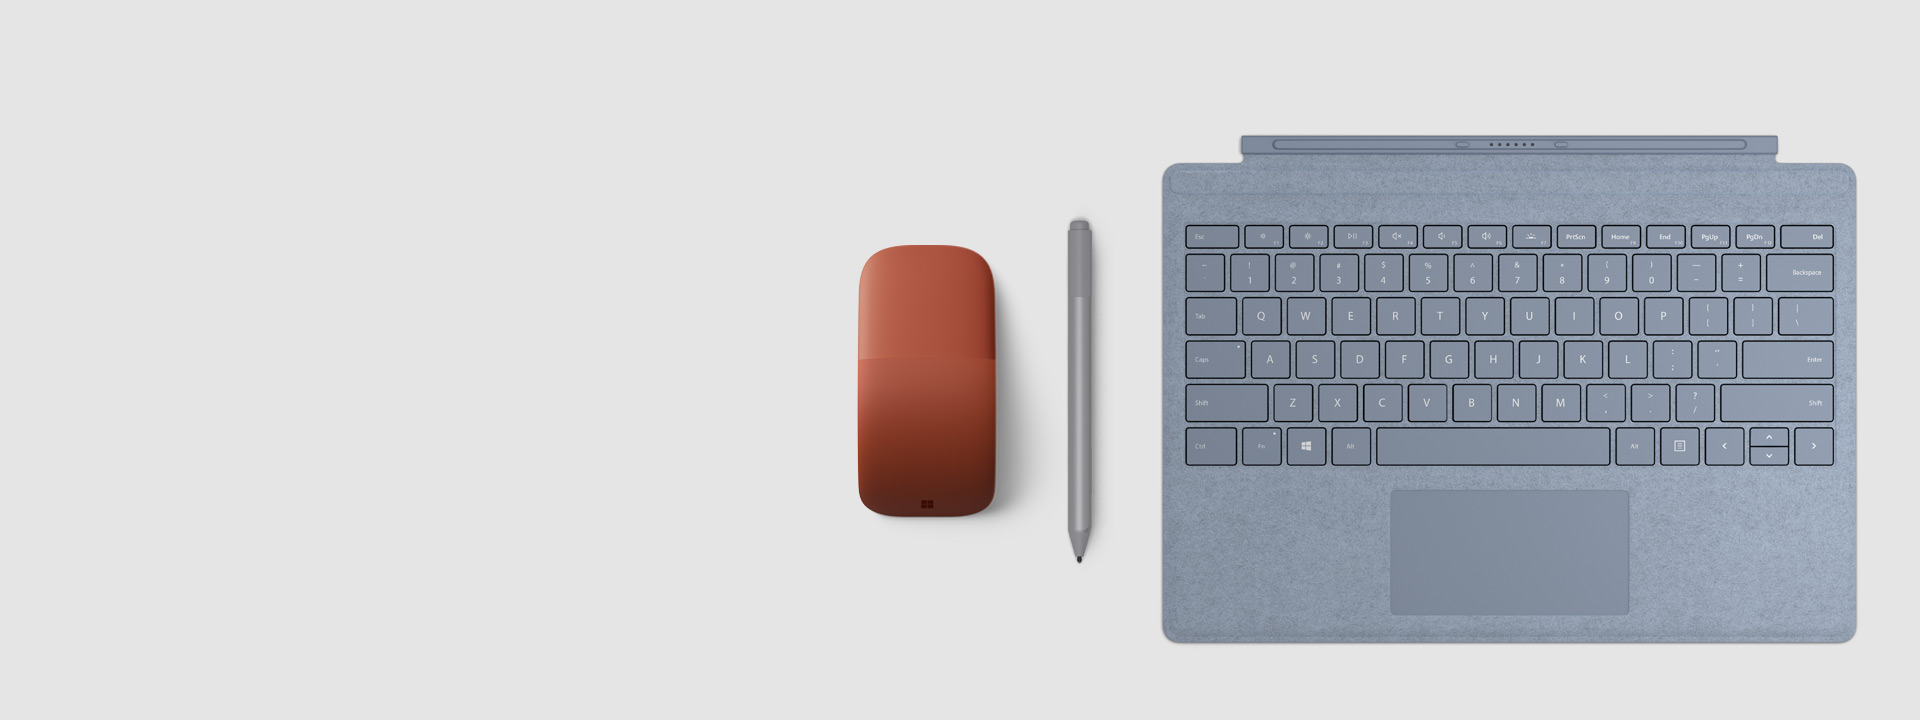 Pluma para Surface, Funda con teclado Signature Edition para Surface y SurfaceArcMouse